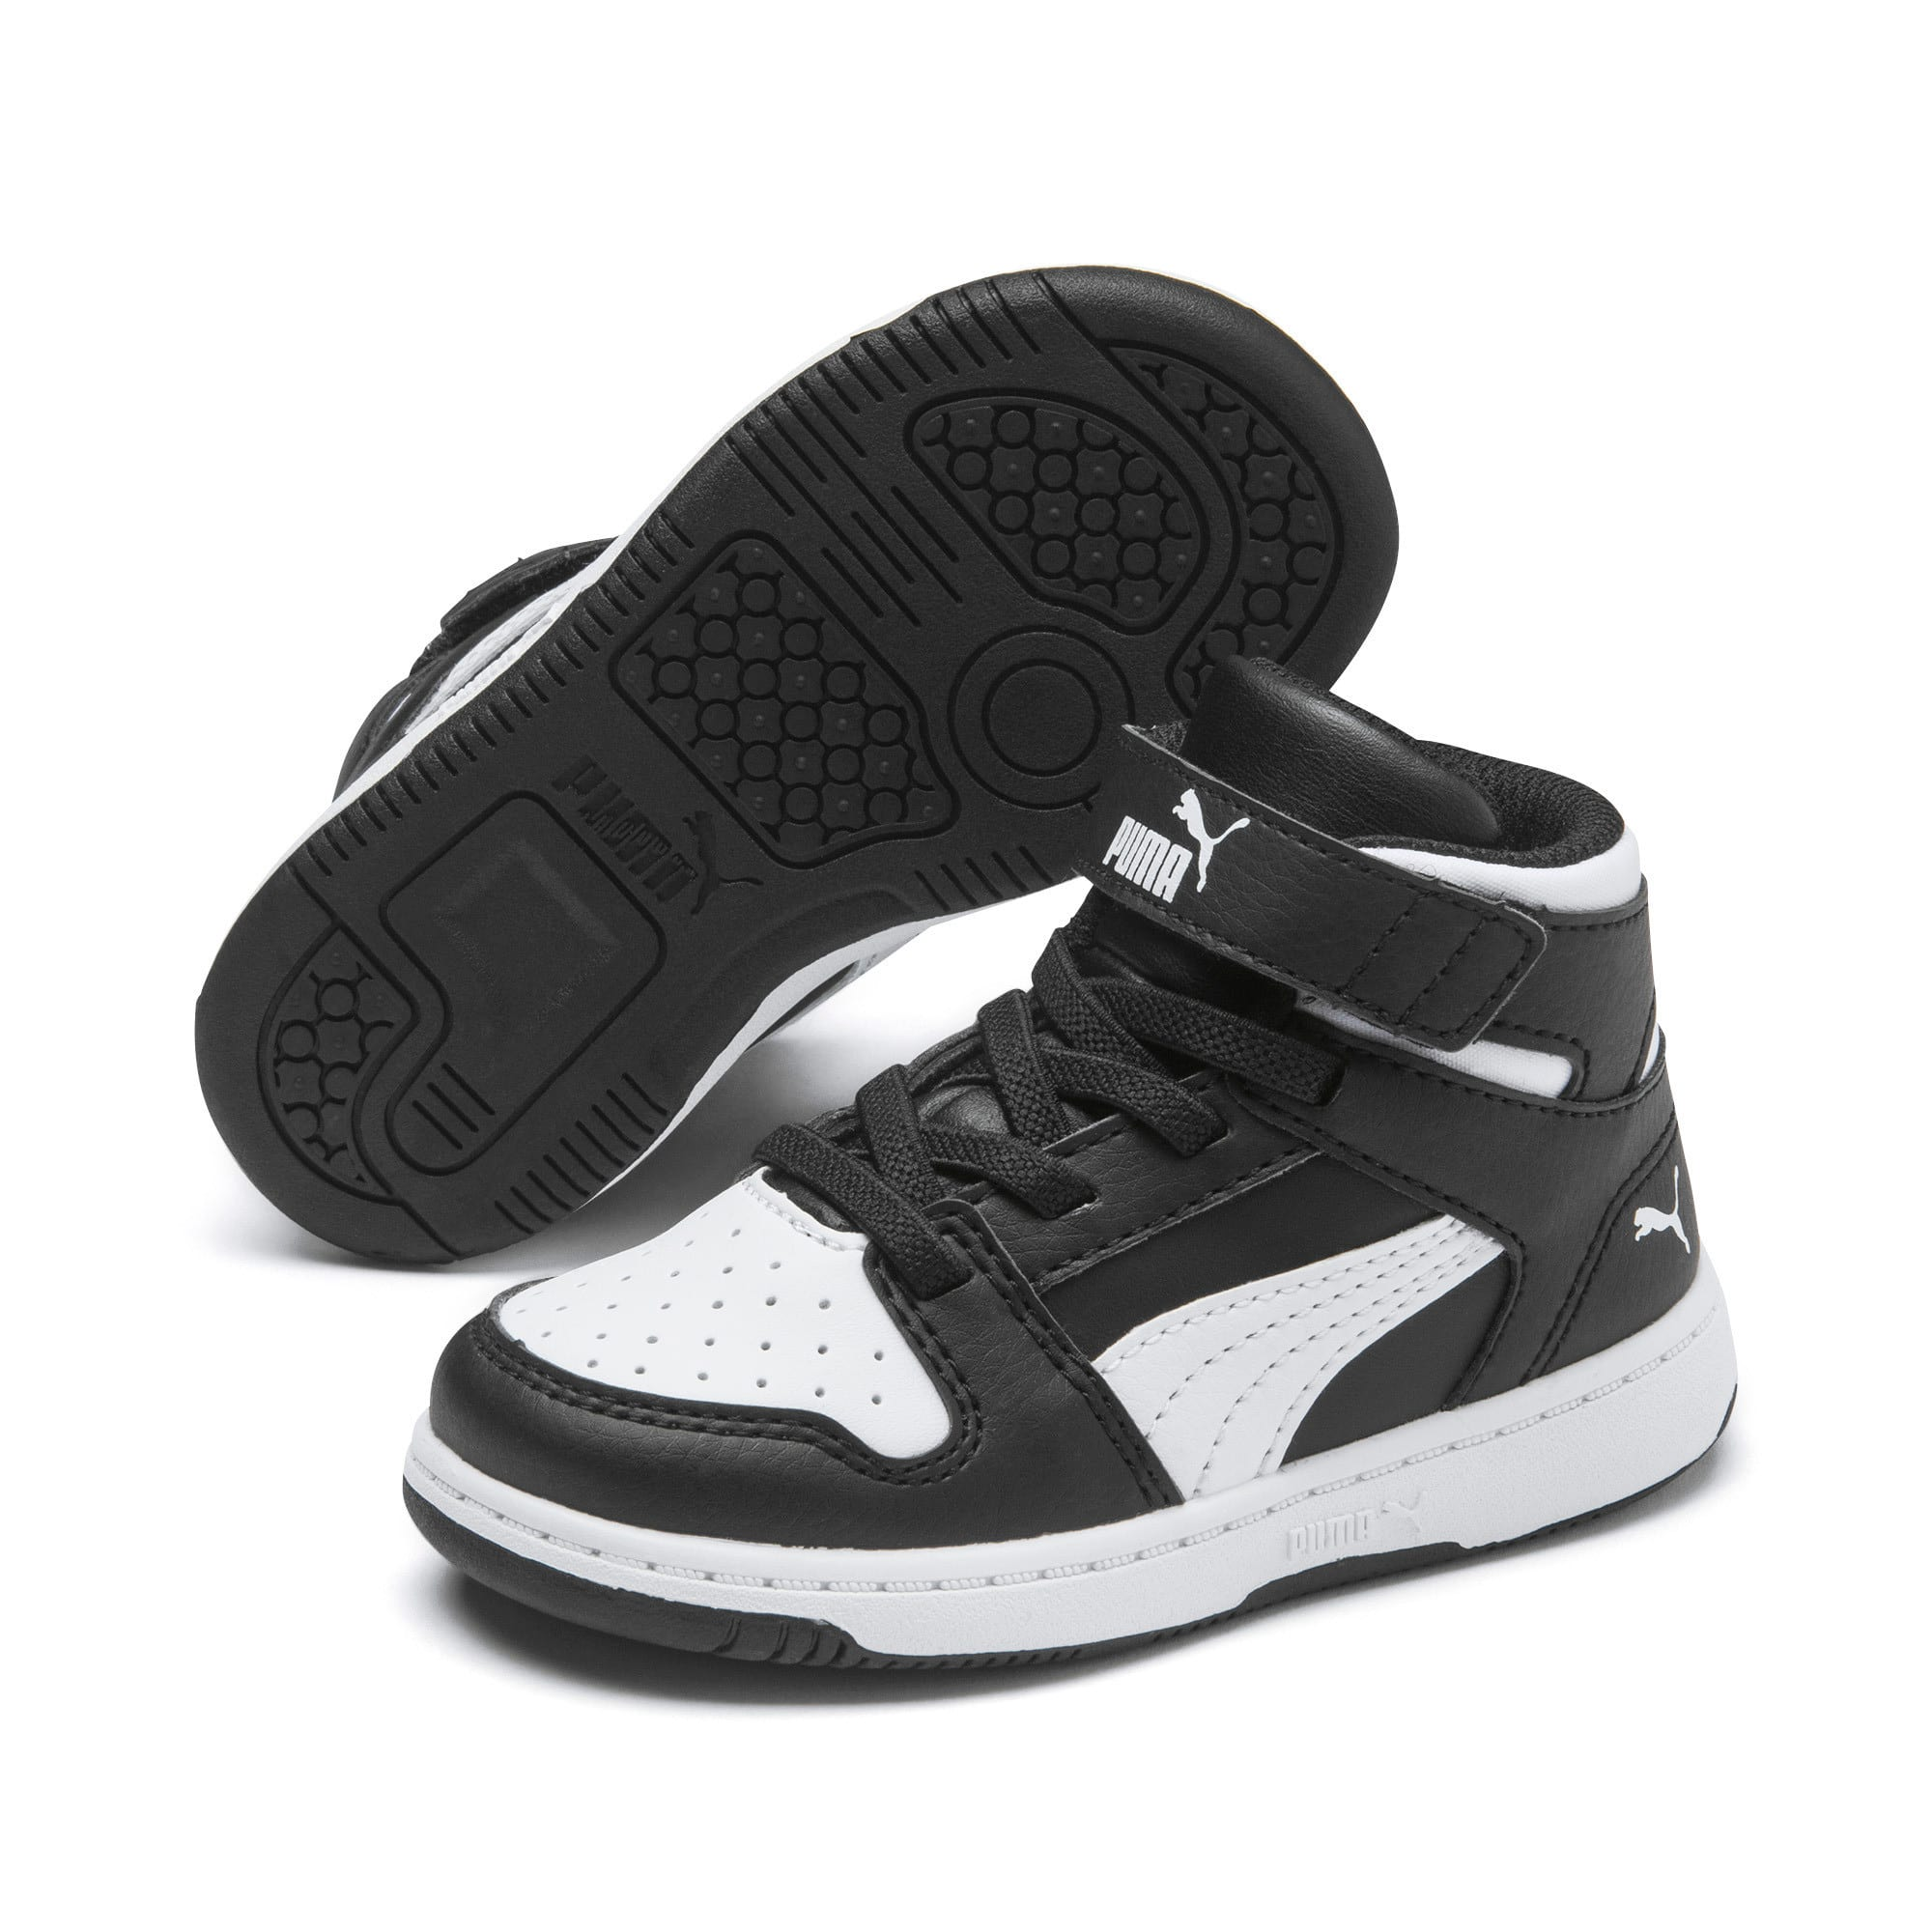 Thumbnail 2 of PUMA Rebound LayUp Toddler Shoes, Puma Black-Puma White, medium